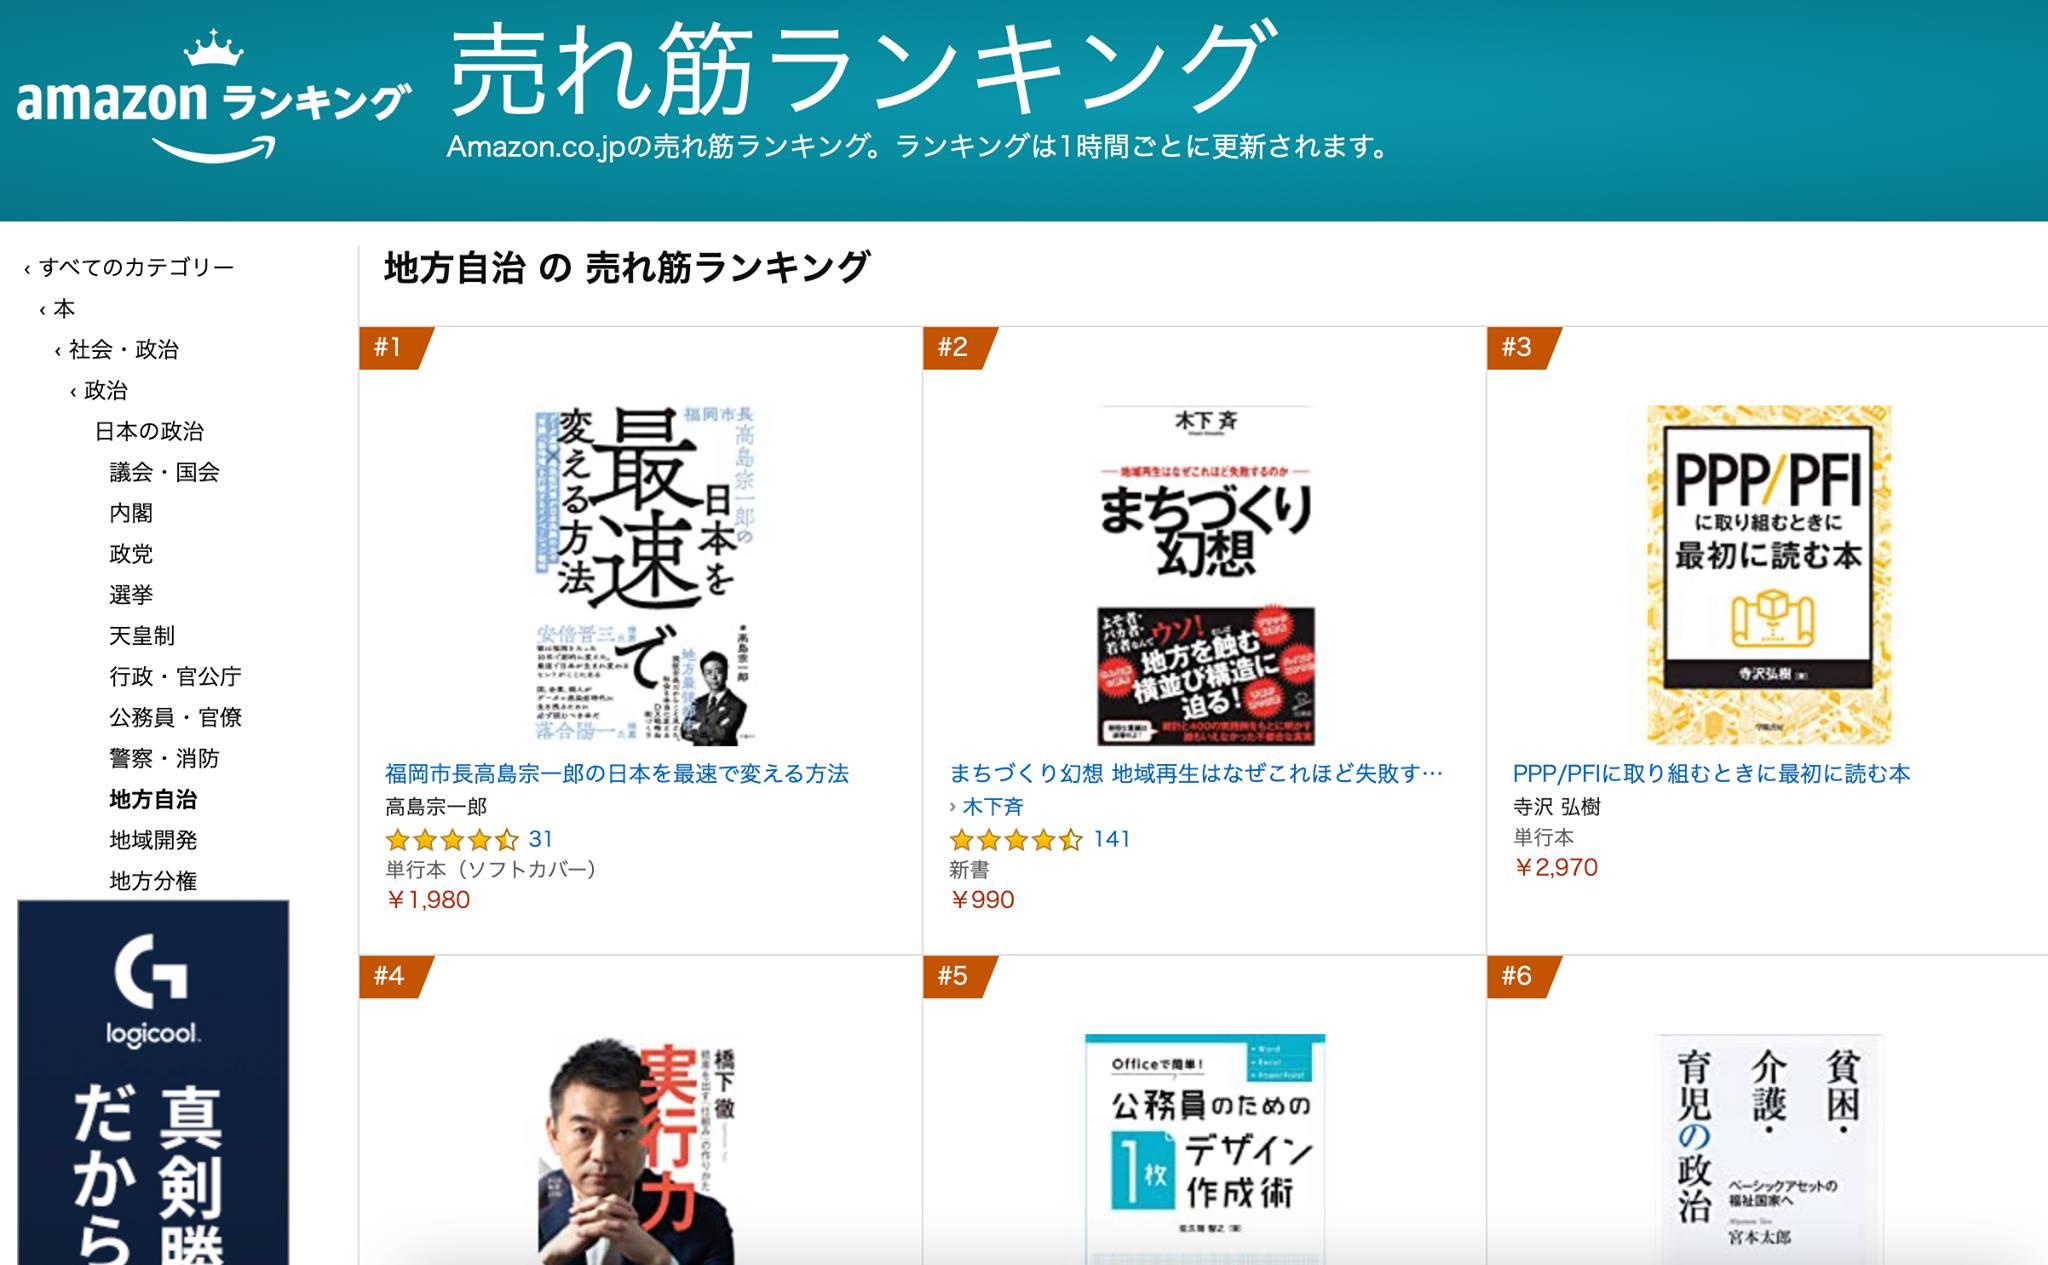 amazon_ranking